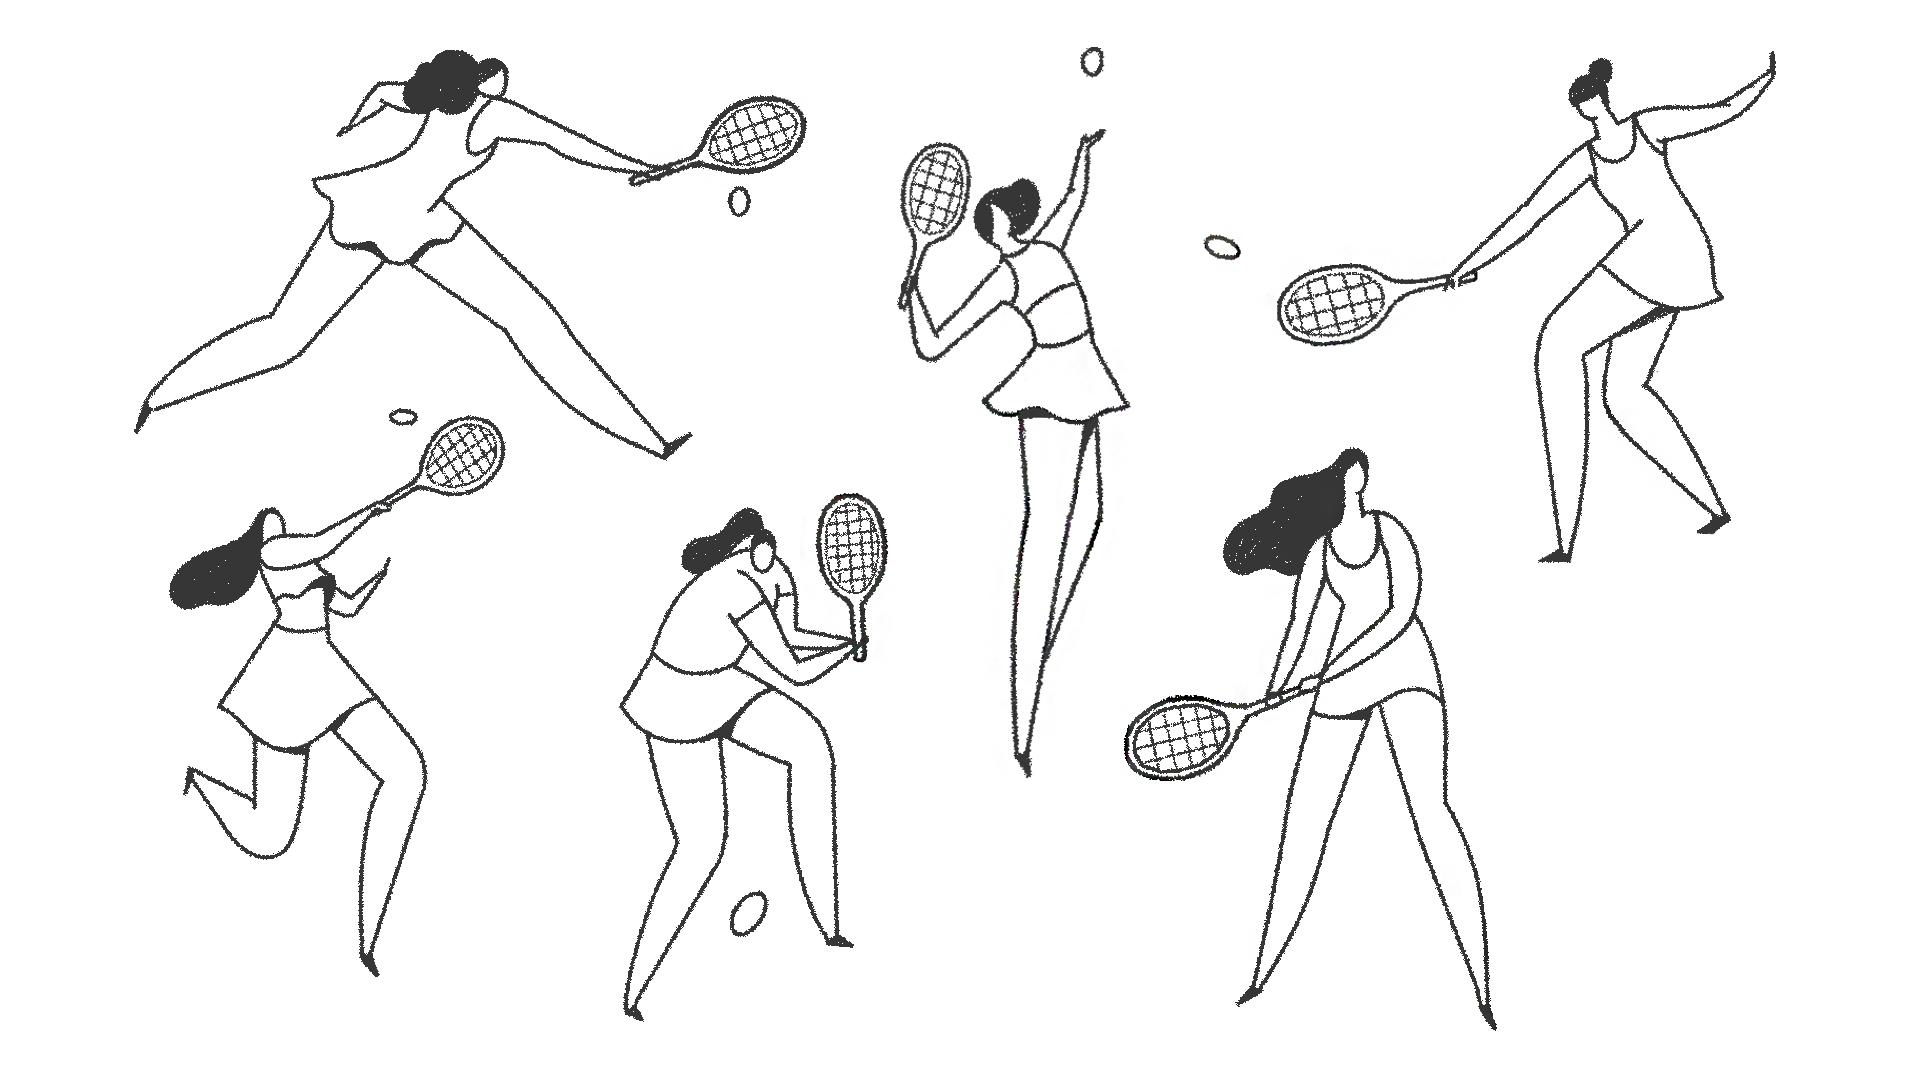 tennisplayers.jpg